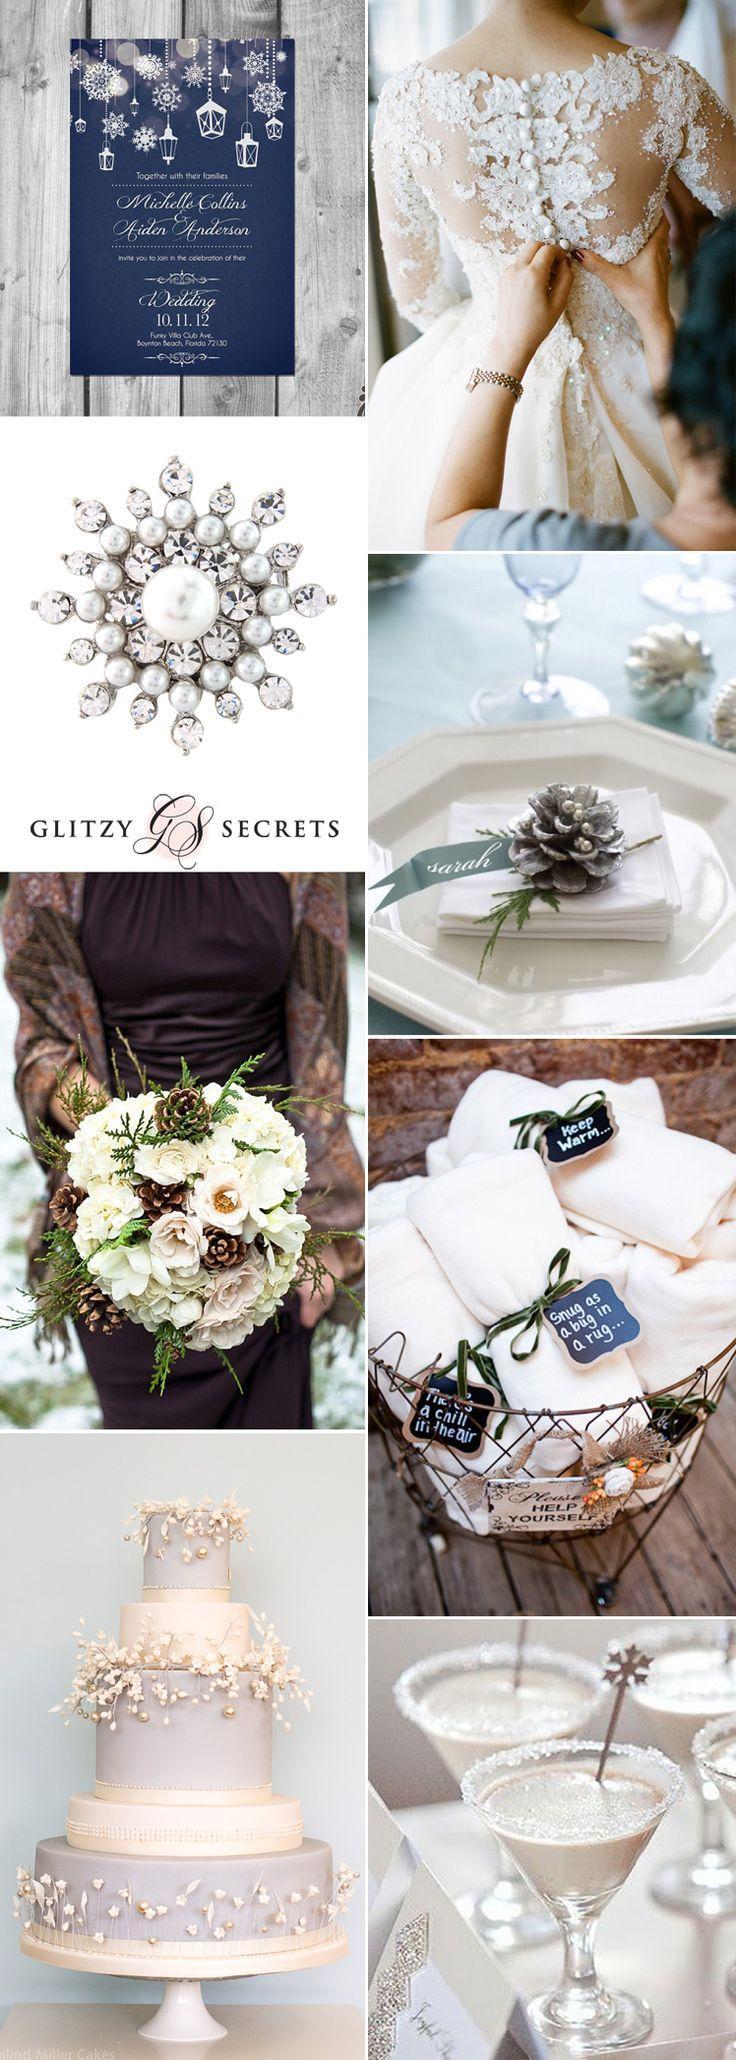 Fine Wedding Theme For Winter Illustration - The Wedding Ideas ...